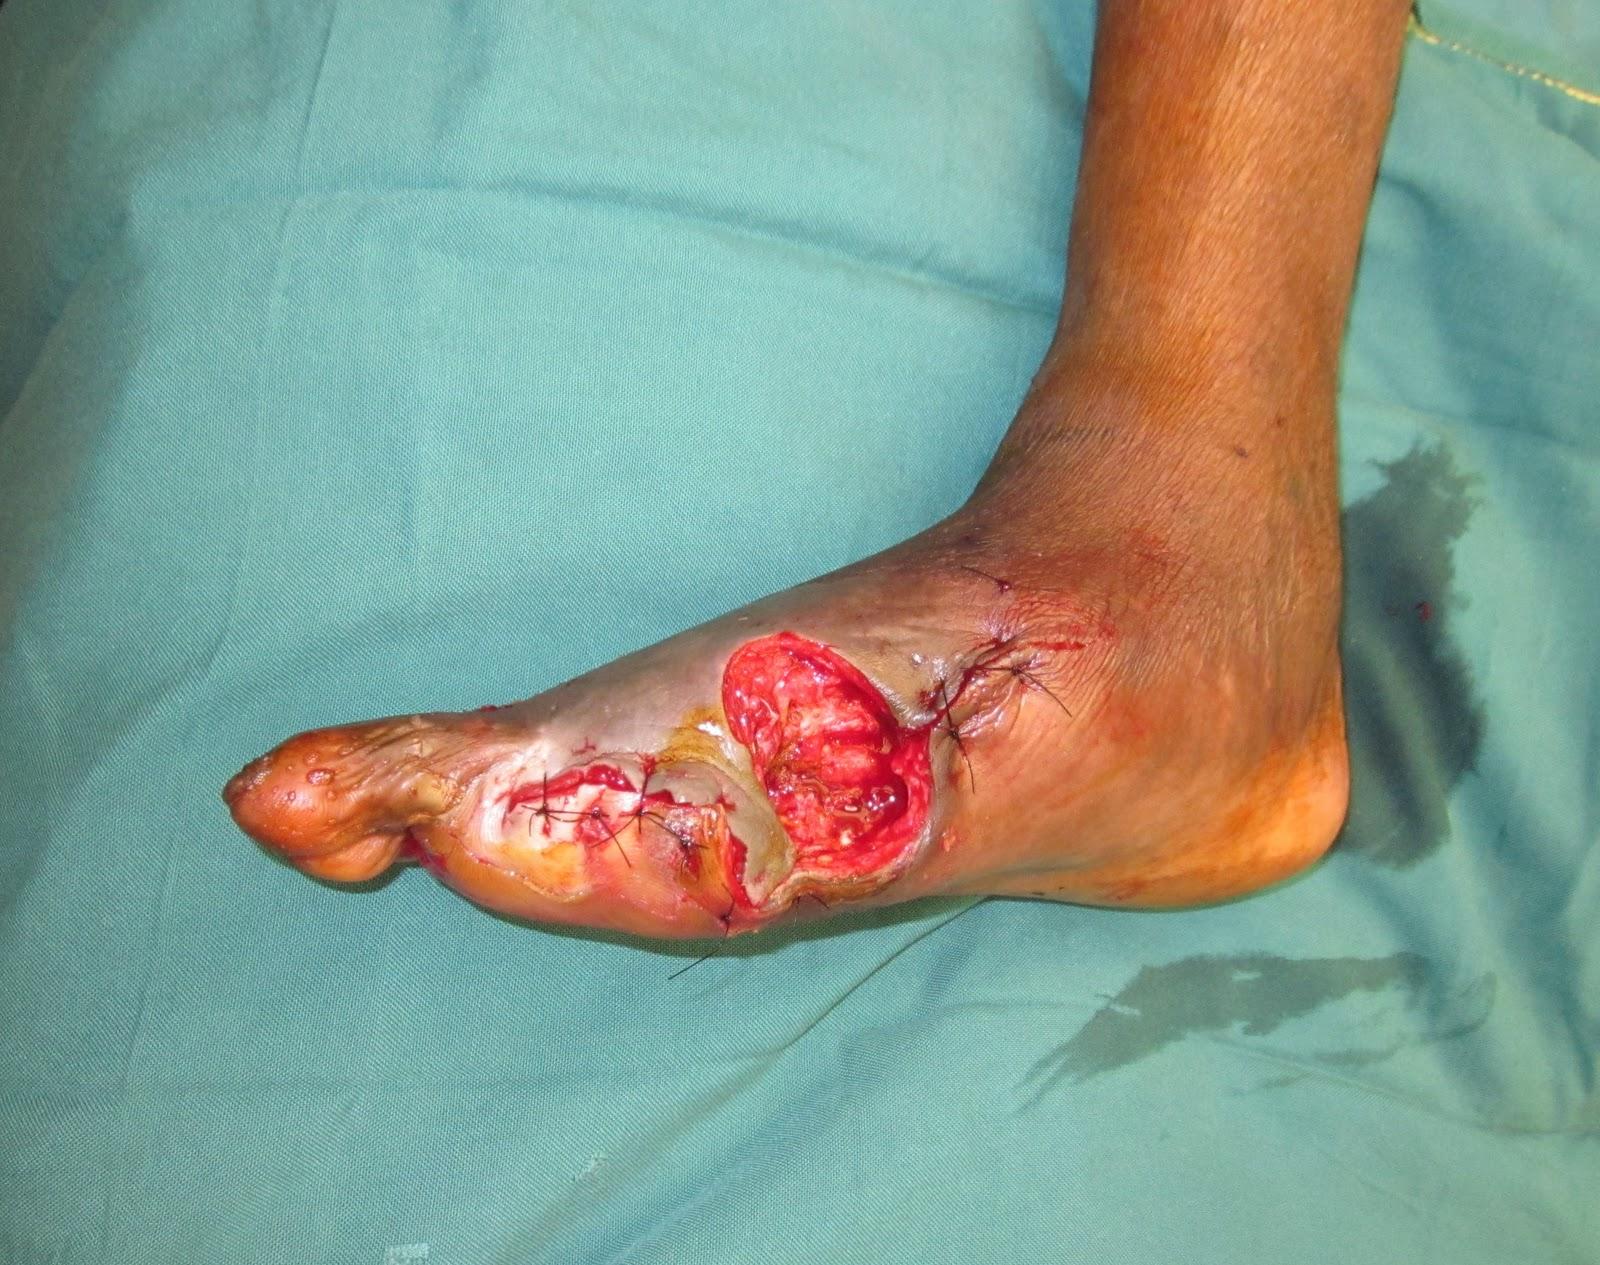 Diabetic foot wet gangrene extending in 1st web space to dorsum foot